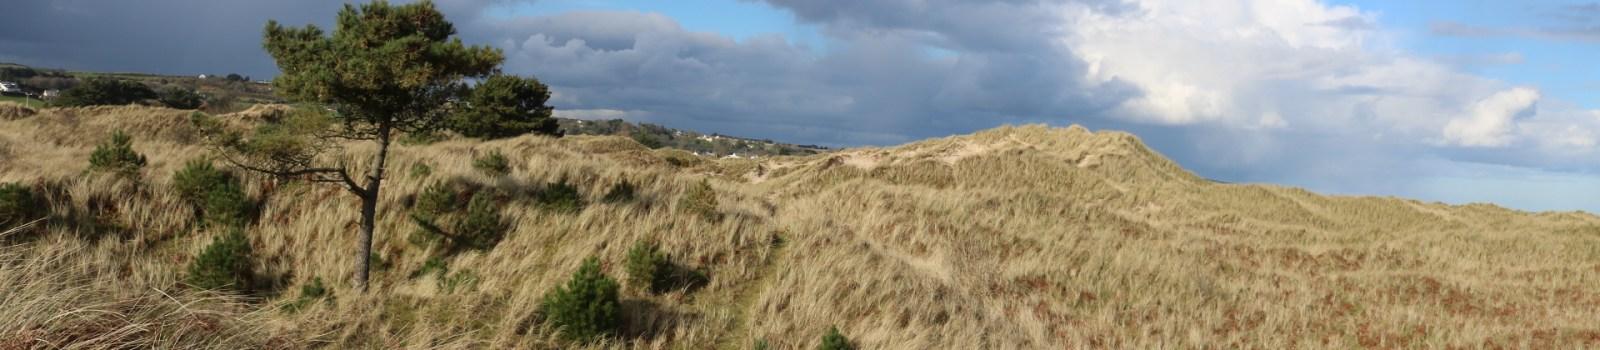 Curracloe Dunes White Gap